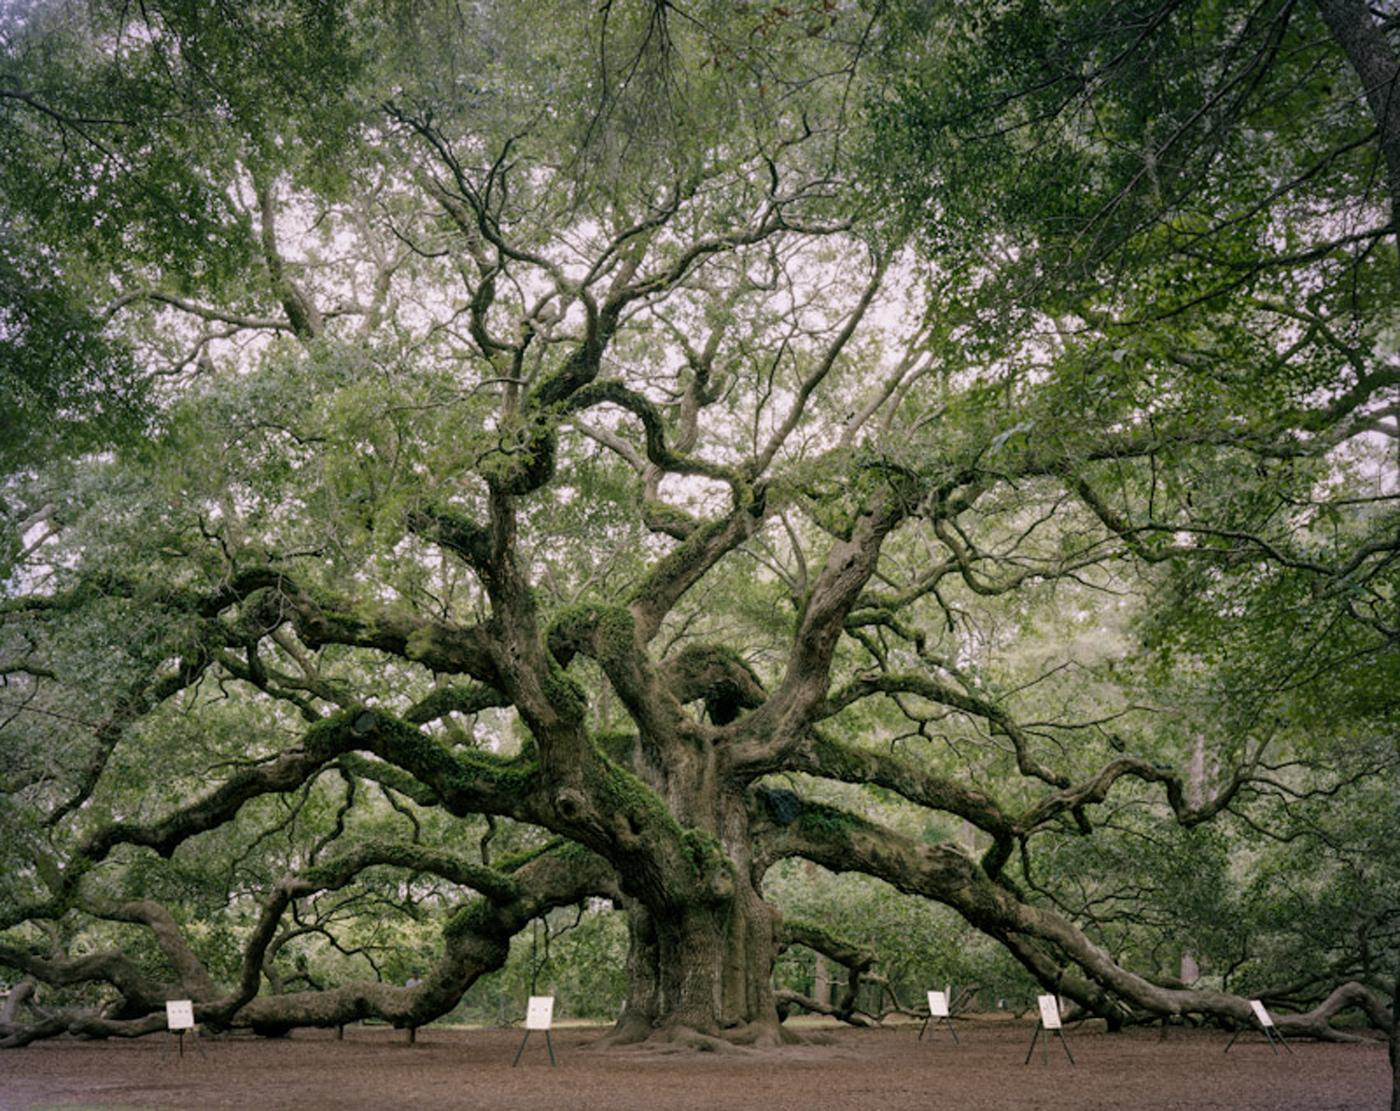 Angel Oak. Johns Island, South Carolina  2011, archival pigment print